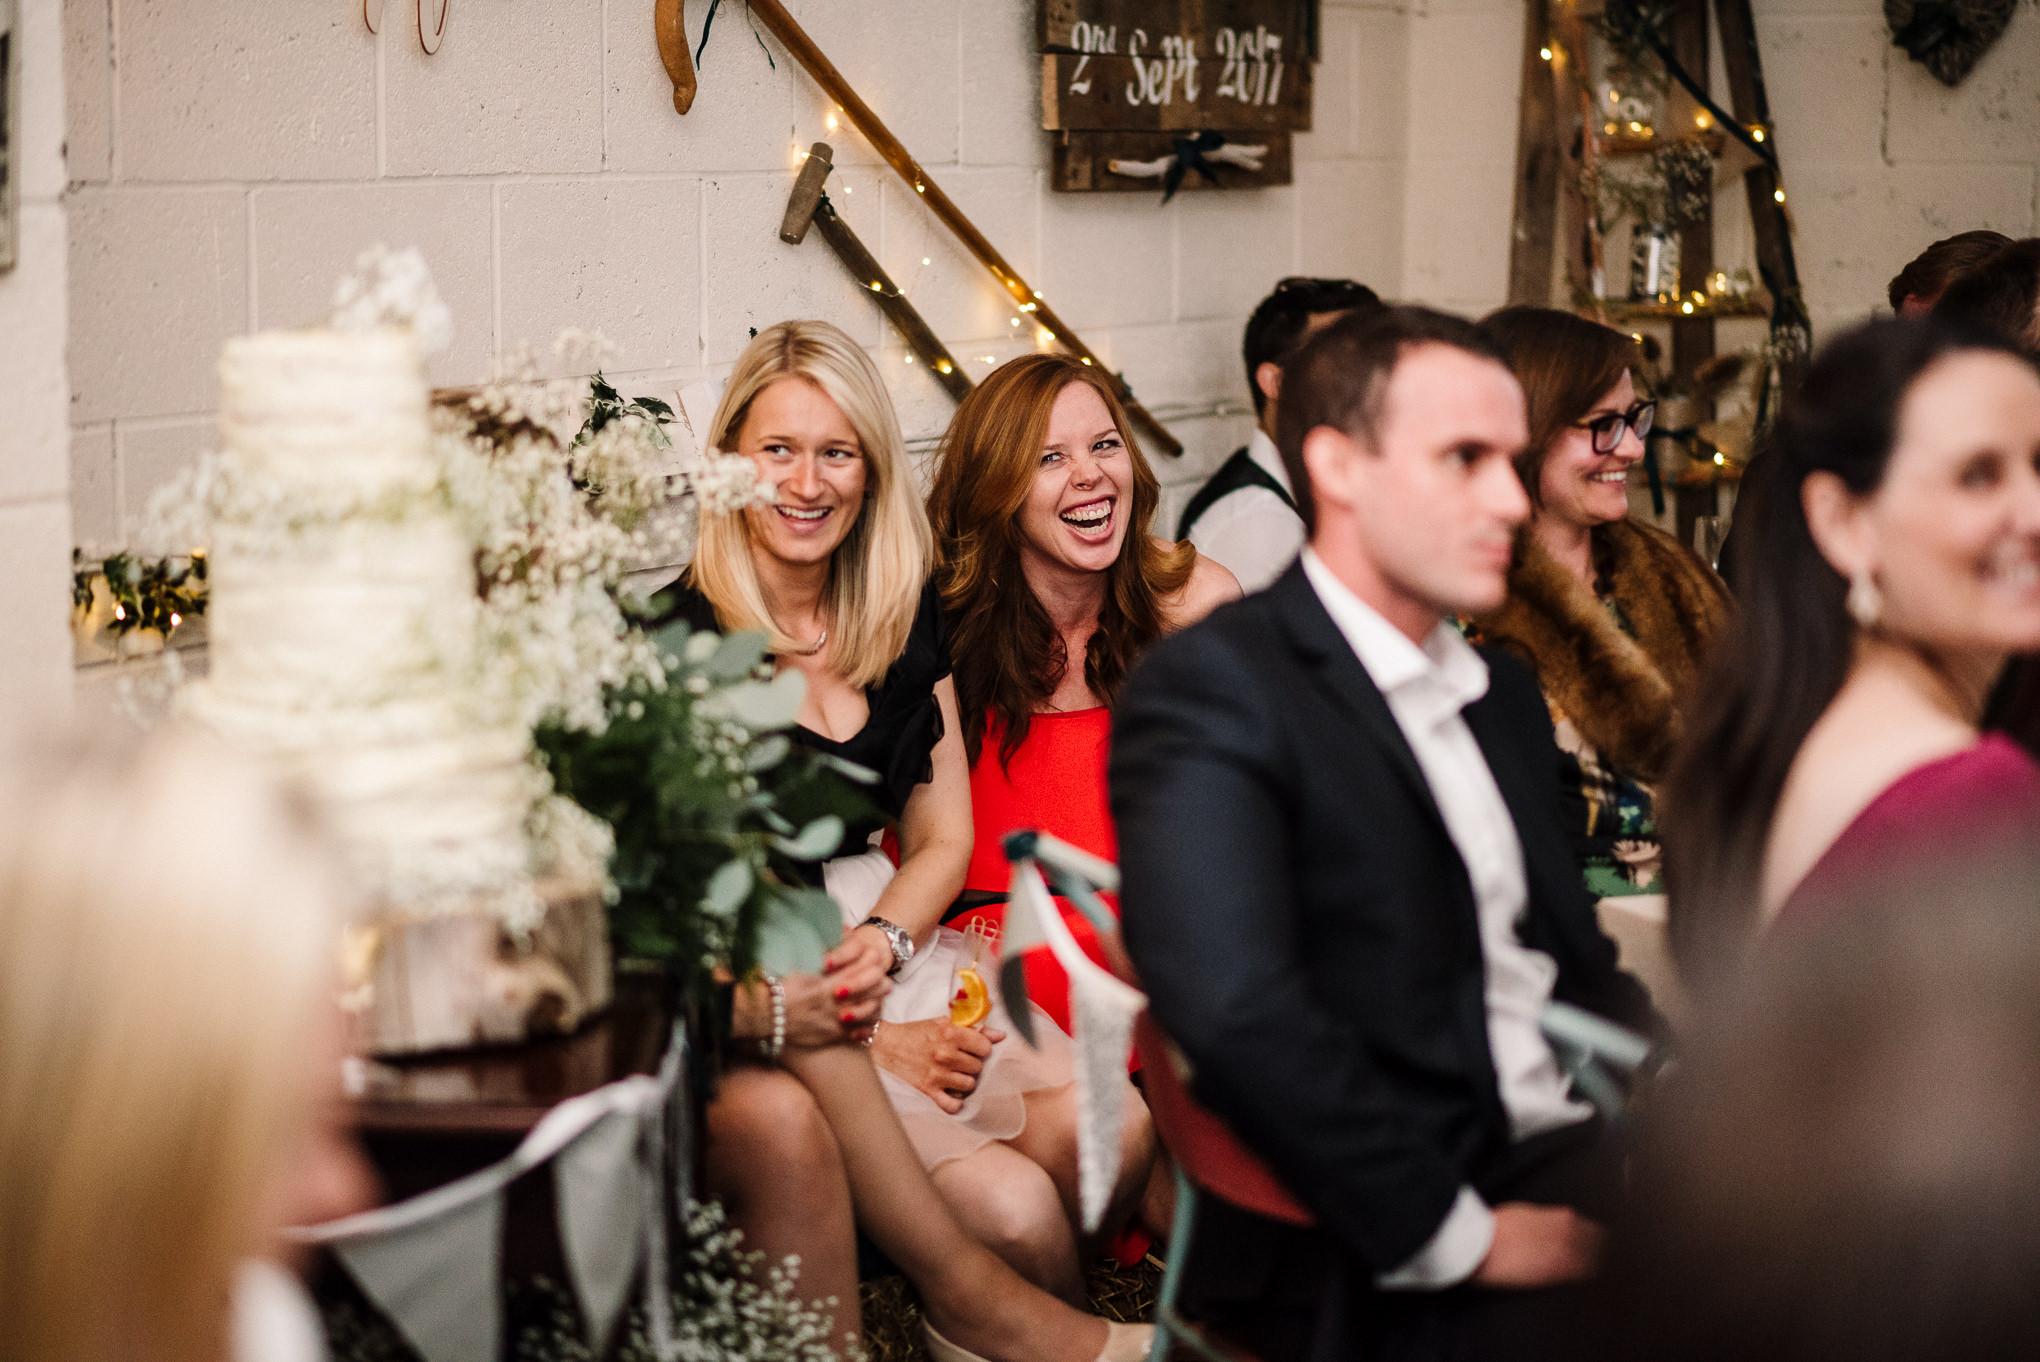 Natural shot of guests laughing